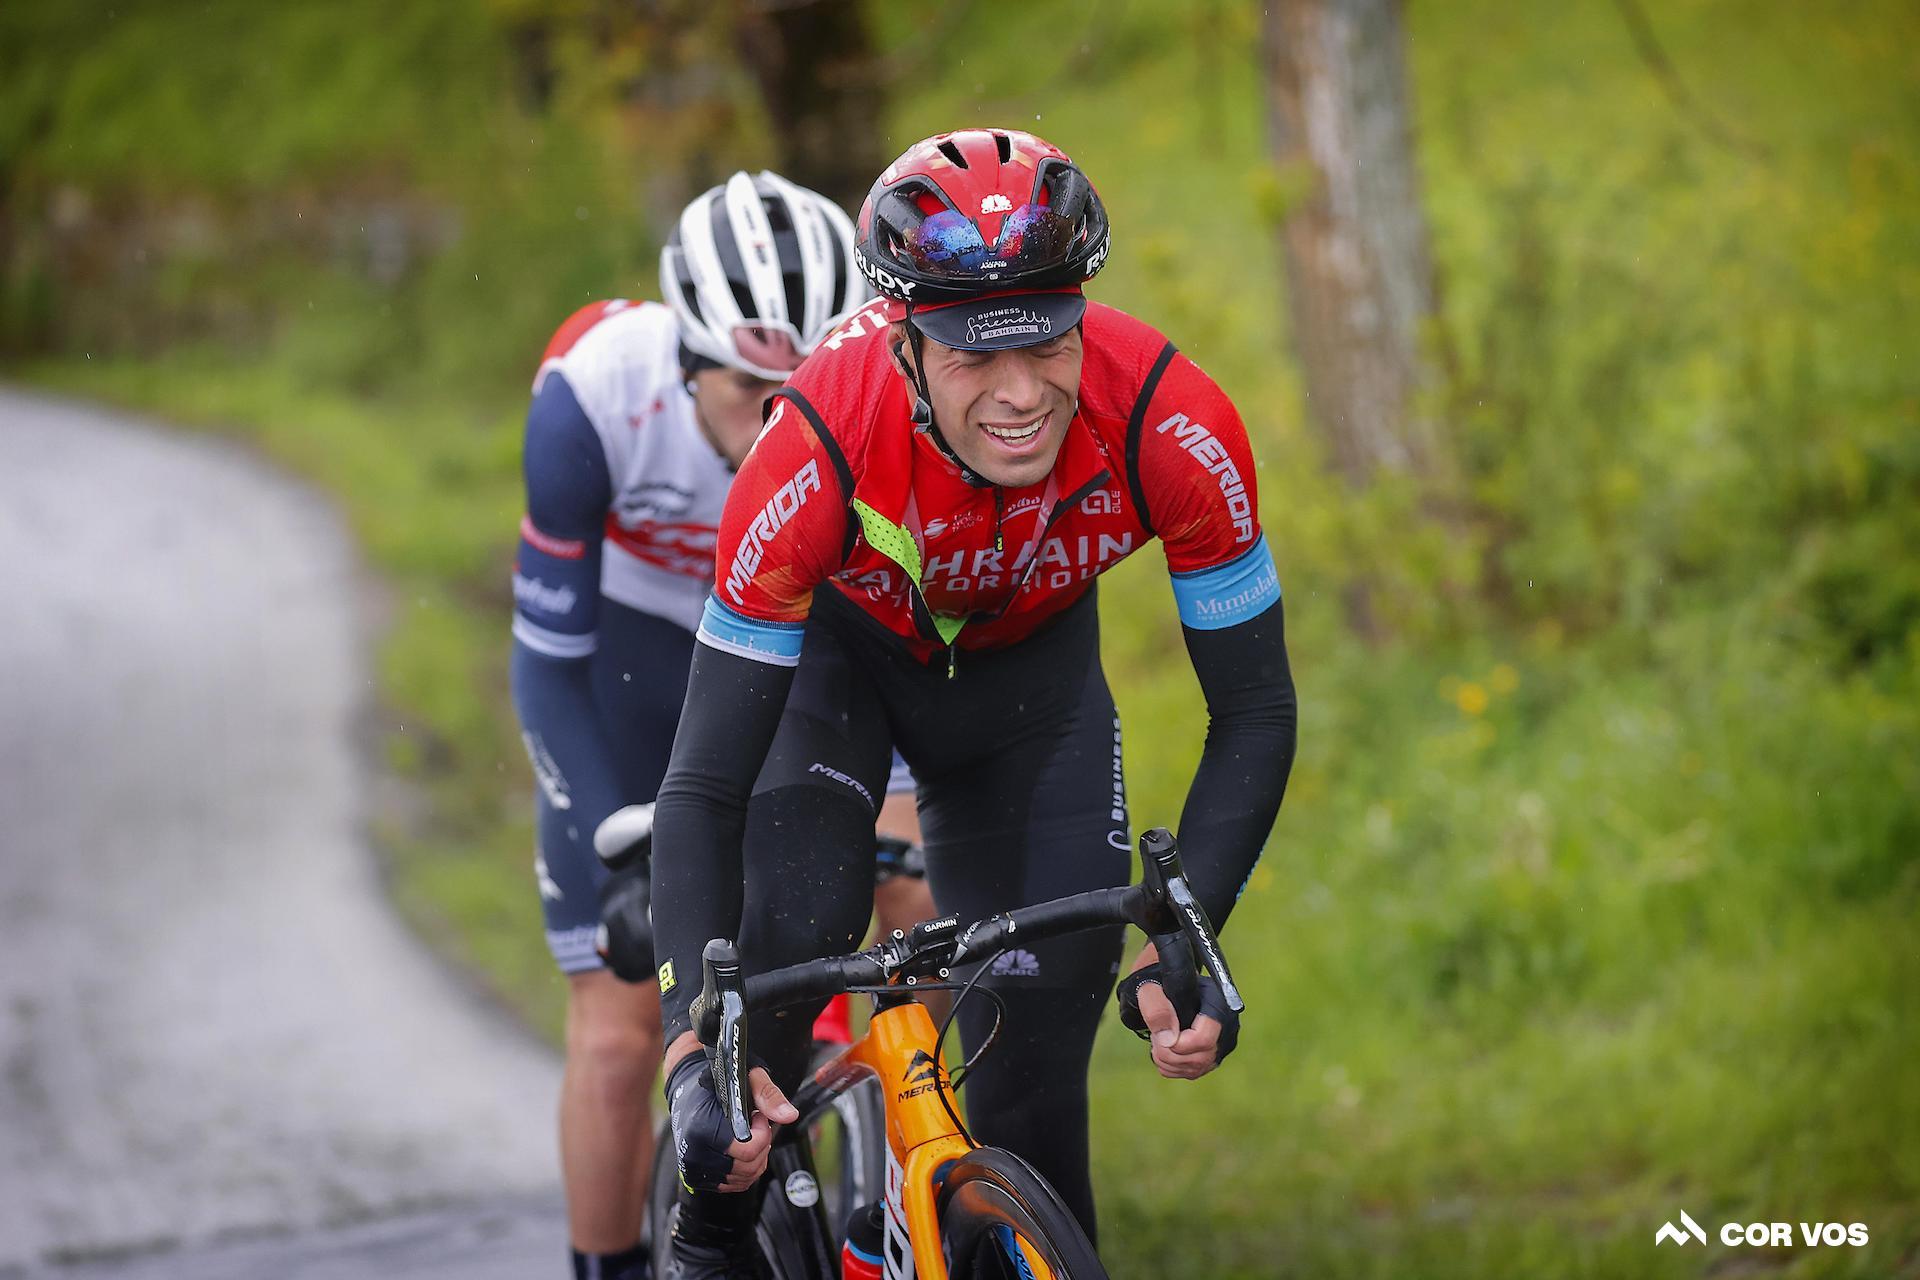 Mikel Landa's Giro d'Italia is over